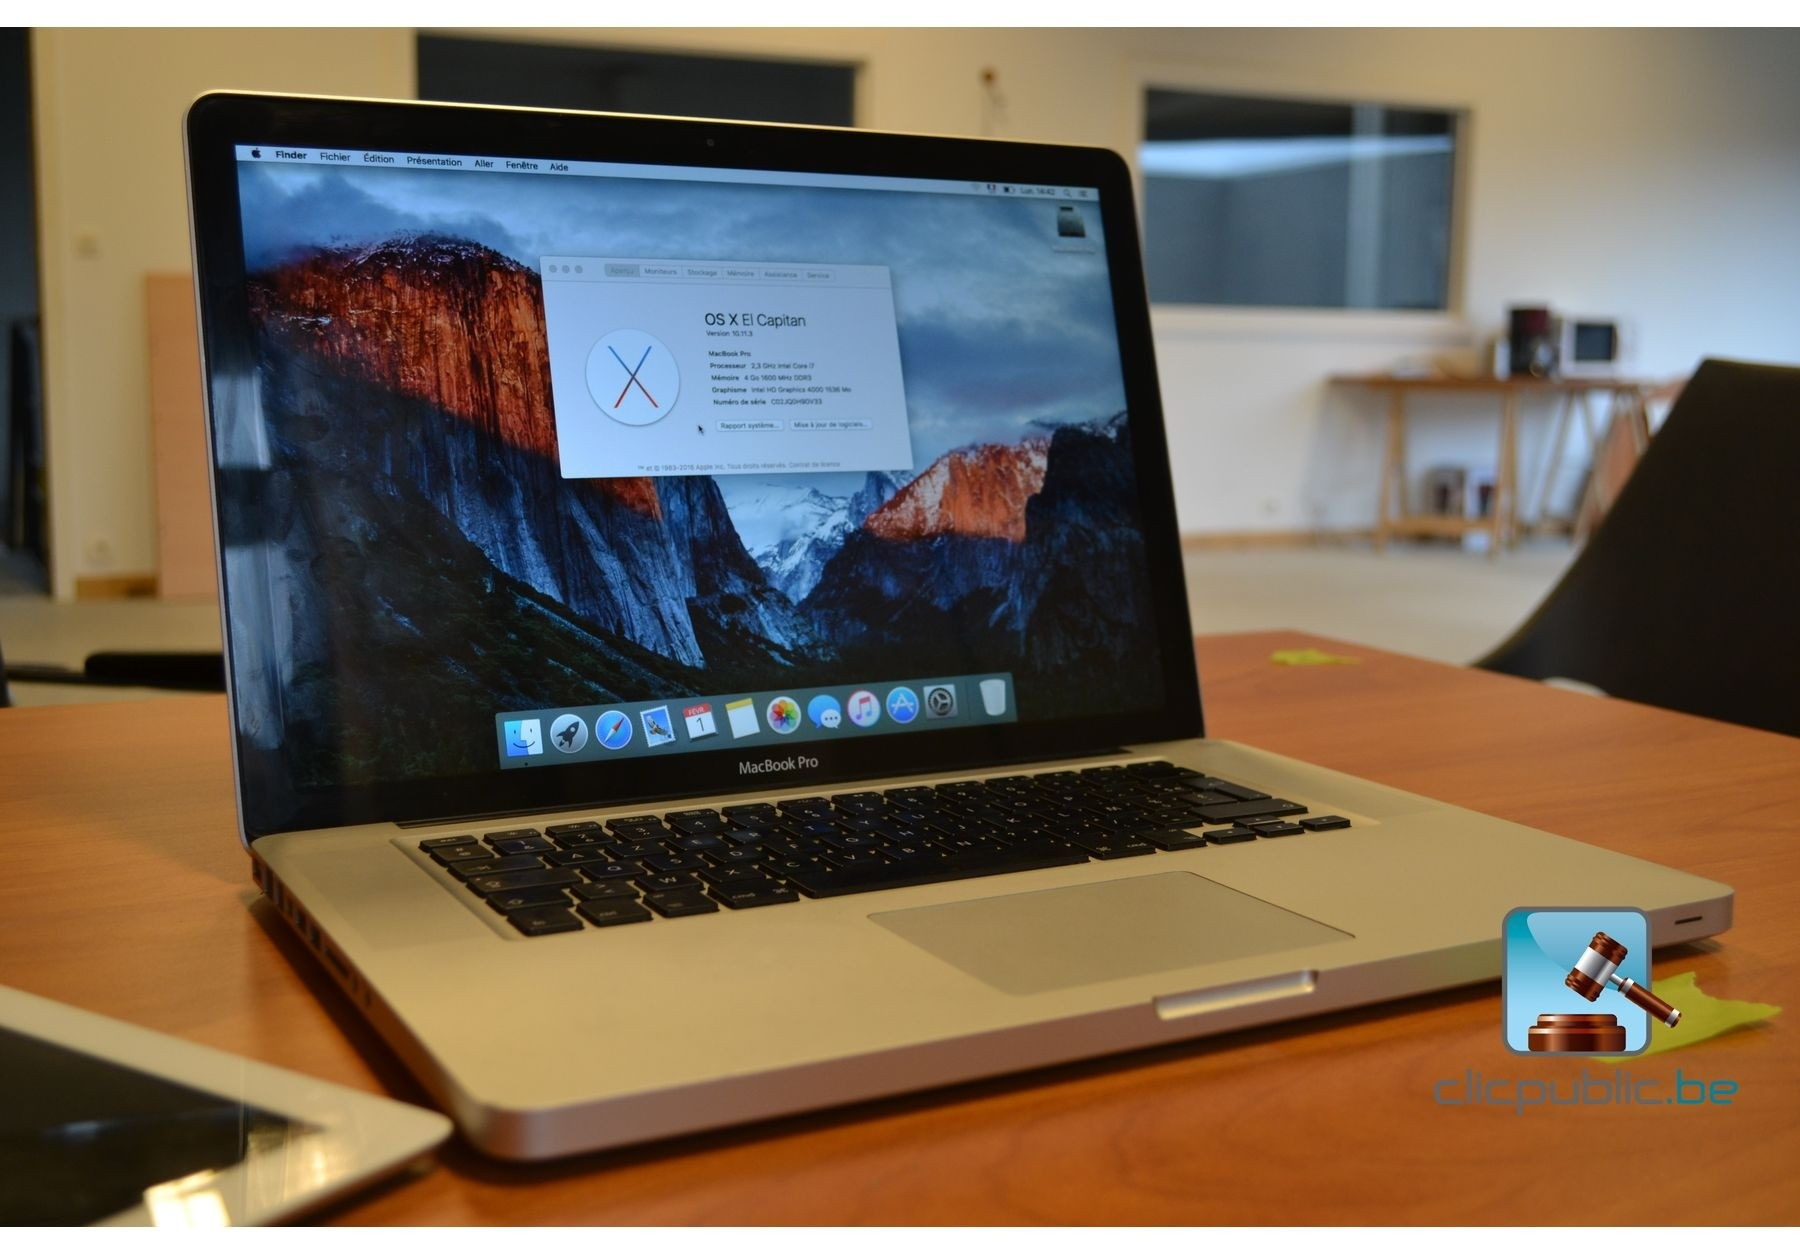 ordinateur portable apple macbook pro ref 5 vendre. Black Bedroom Furniture Sets. Home Design Ideas